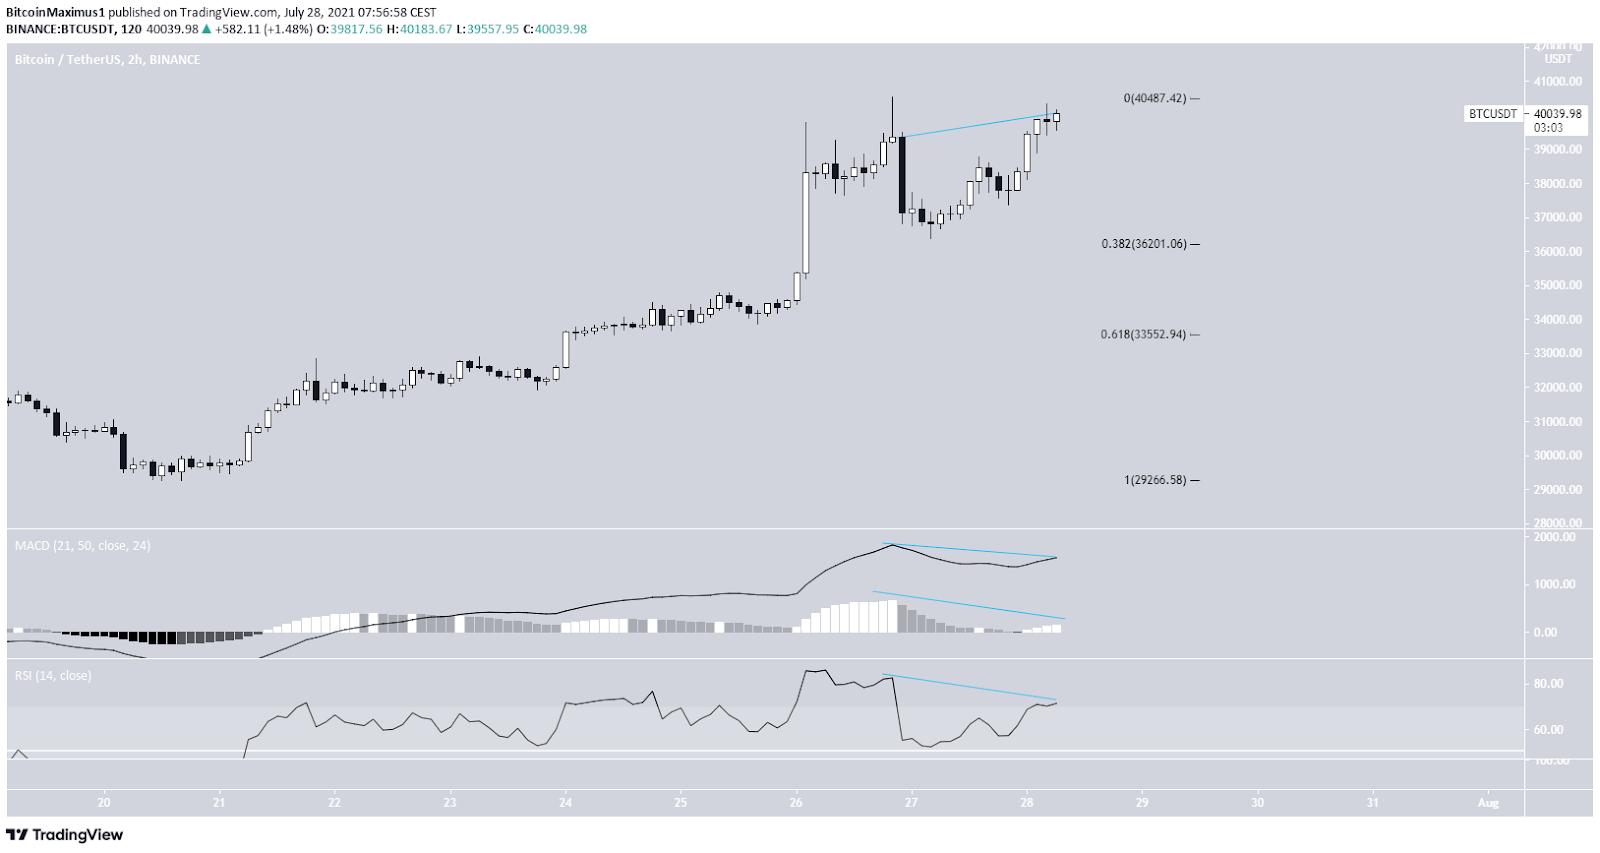 Bitcoin Preis Kurs BTC 2-Stunden-Chart 28.07.2021